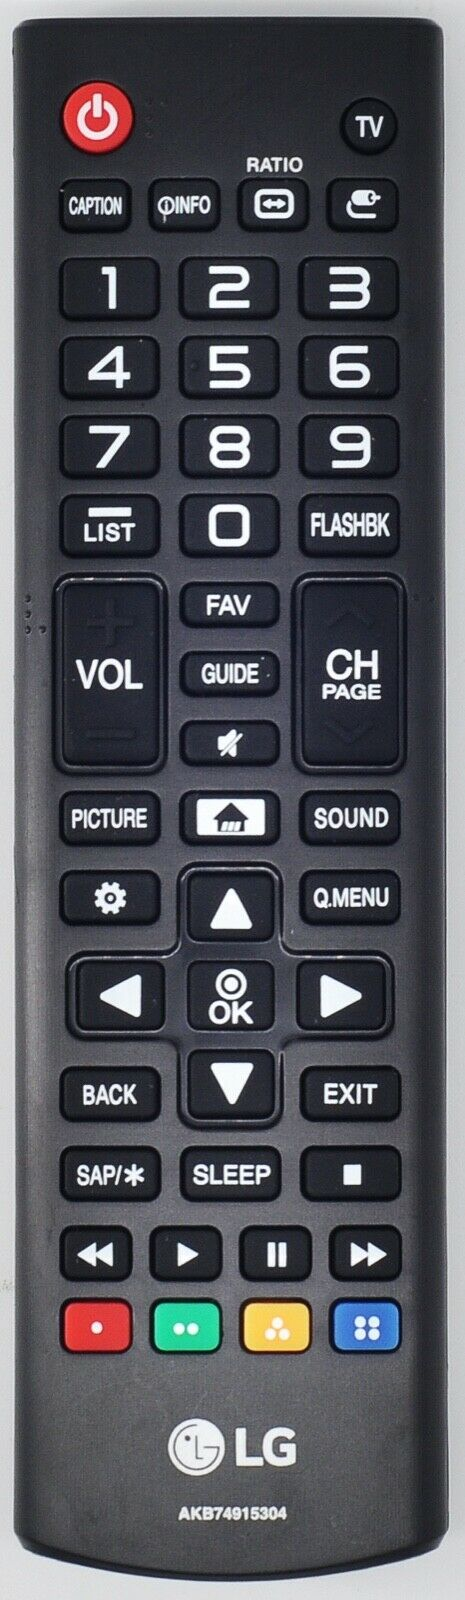 Original New OEM LG AKB74915304 Remote Control for LG 4K UHD Smart TVs